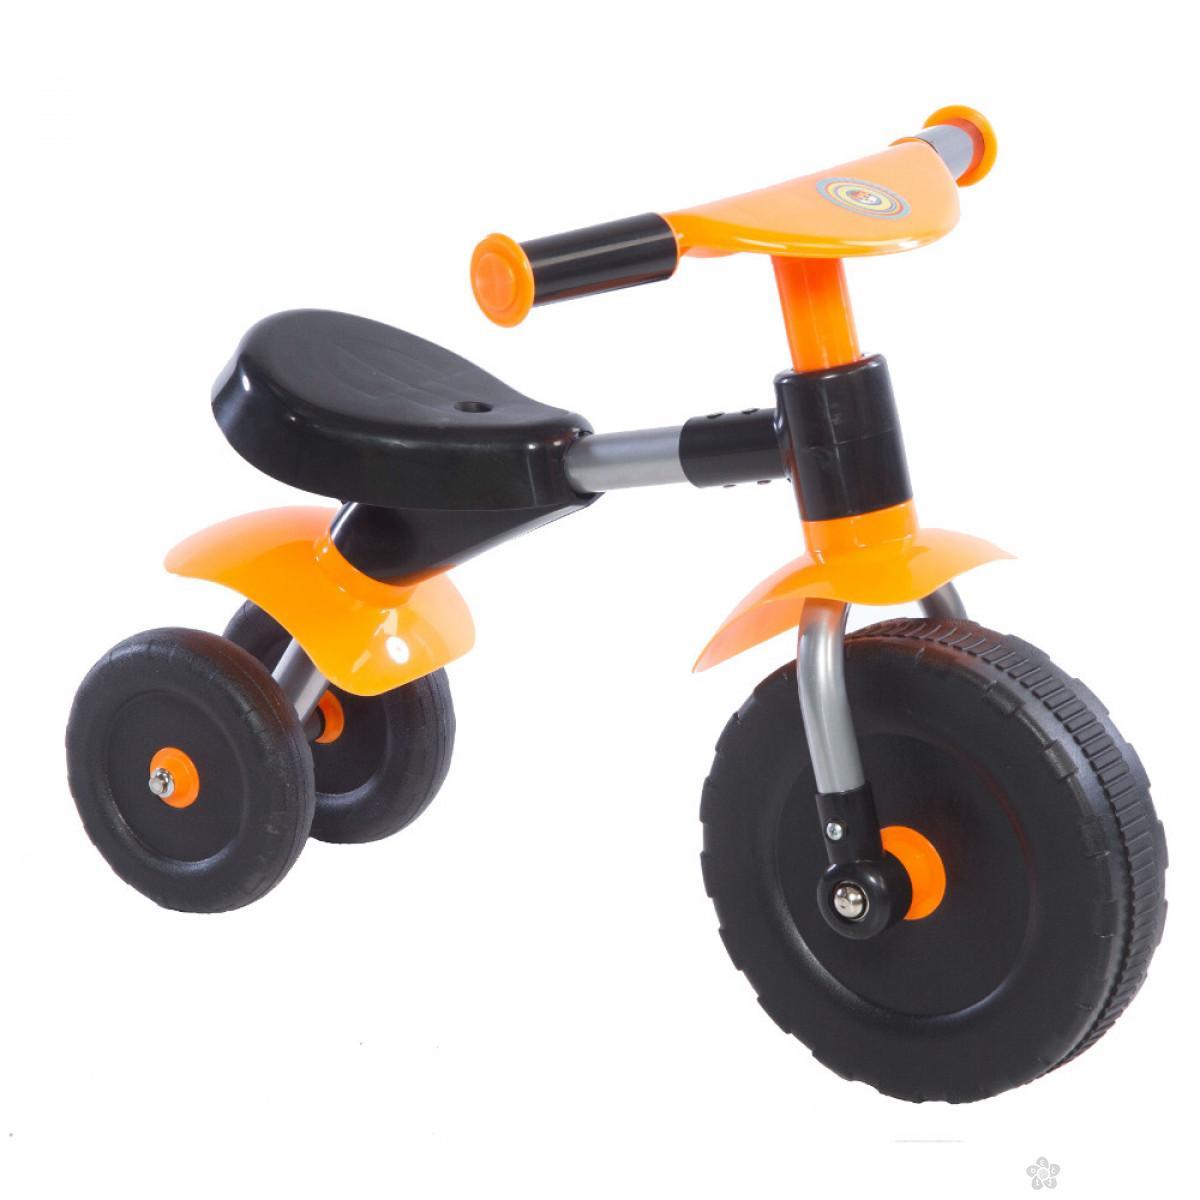 Dečija guralica Buggy narandžasta, 540087